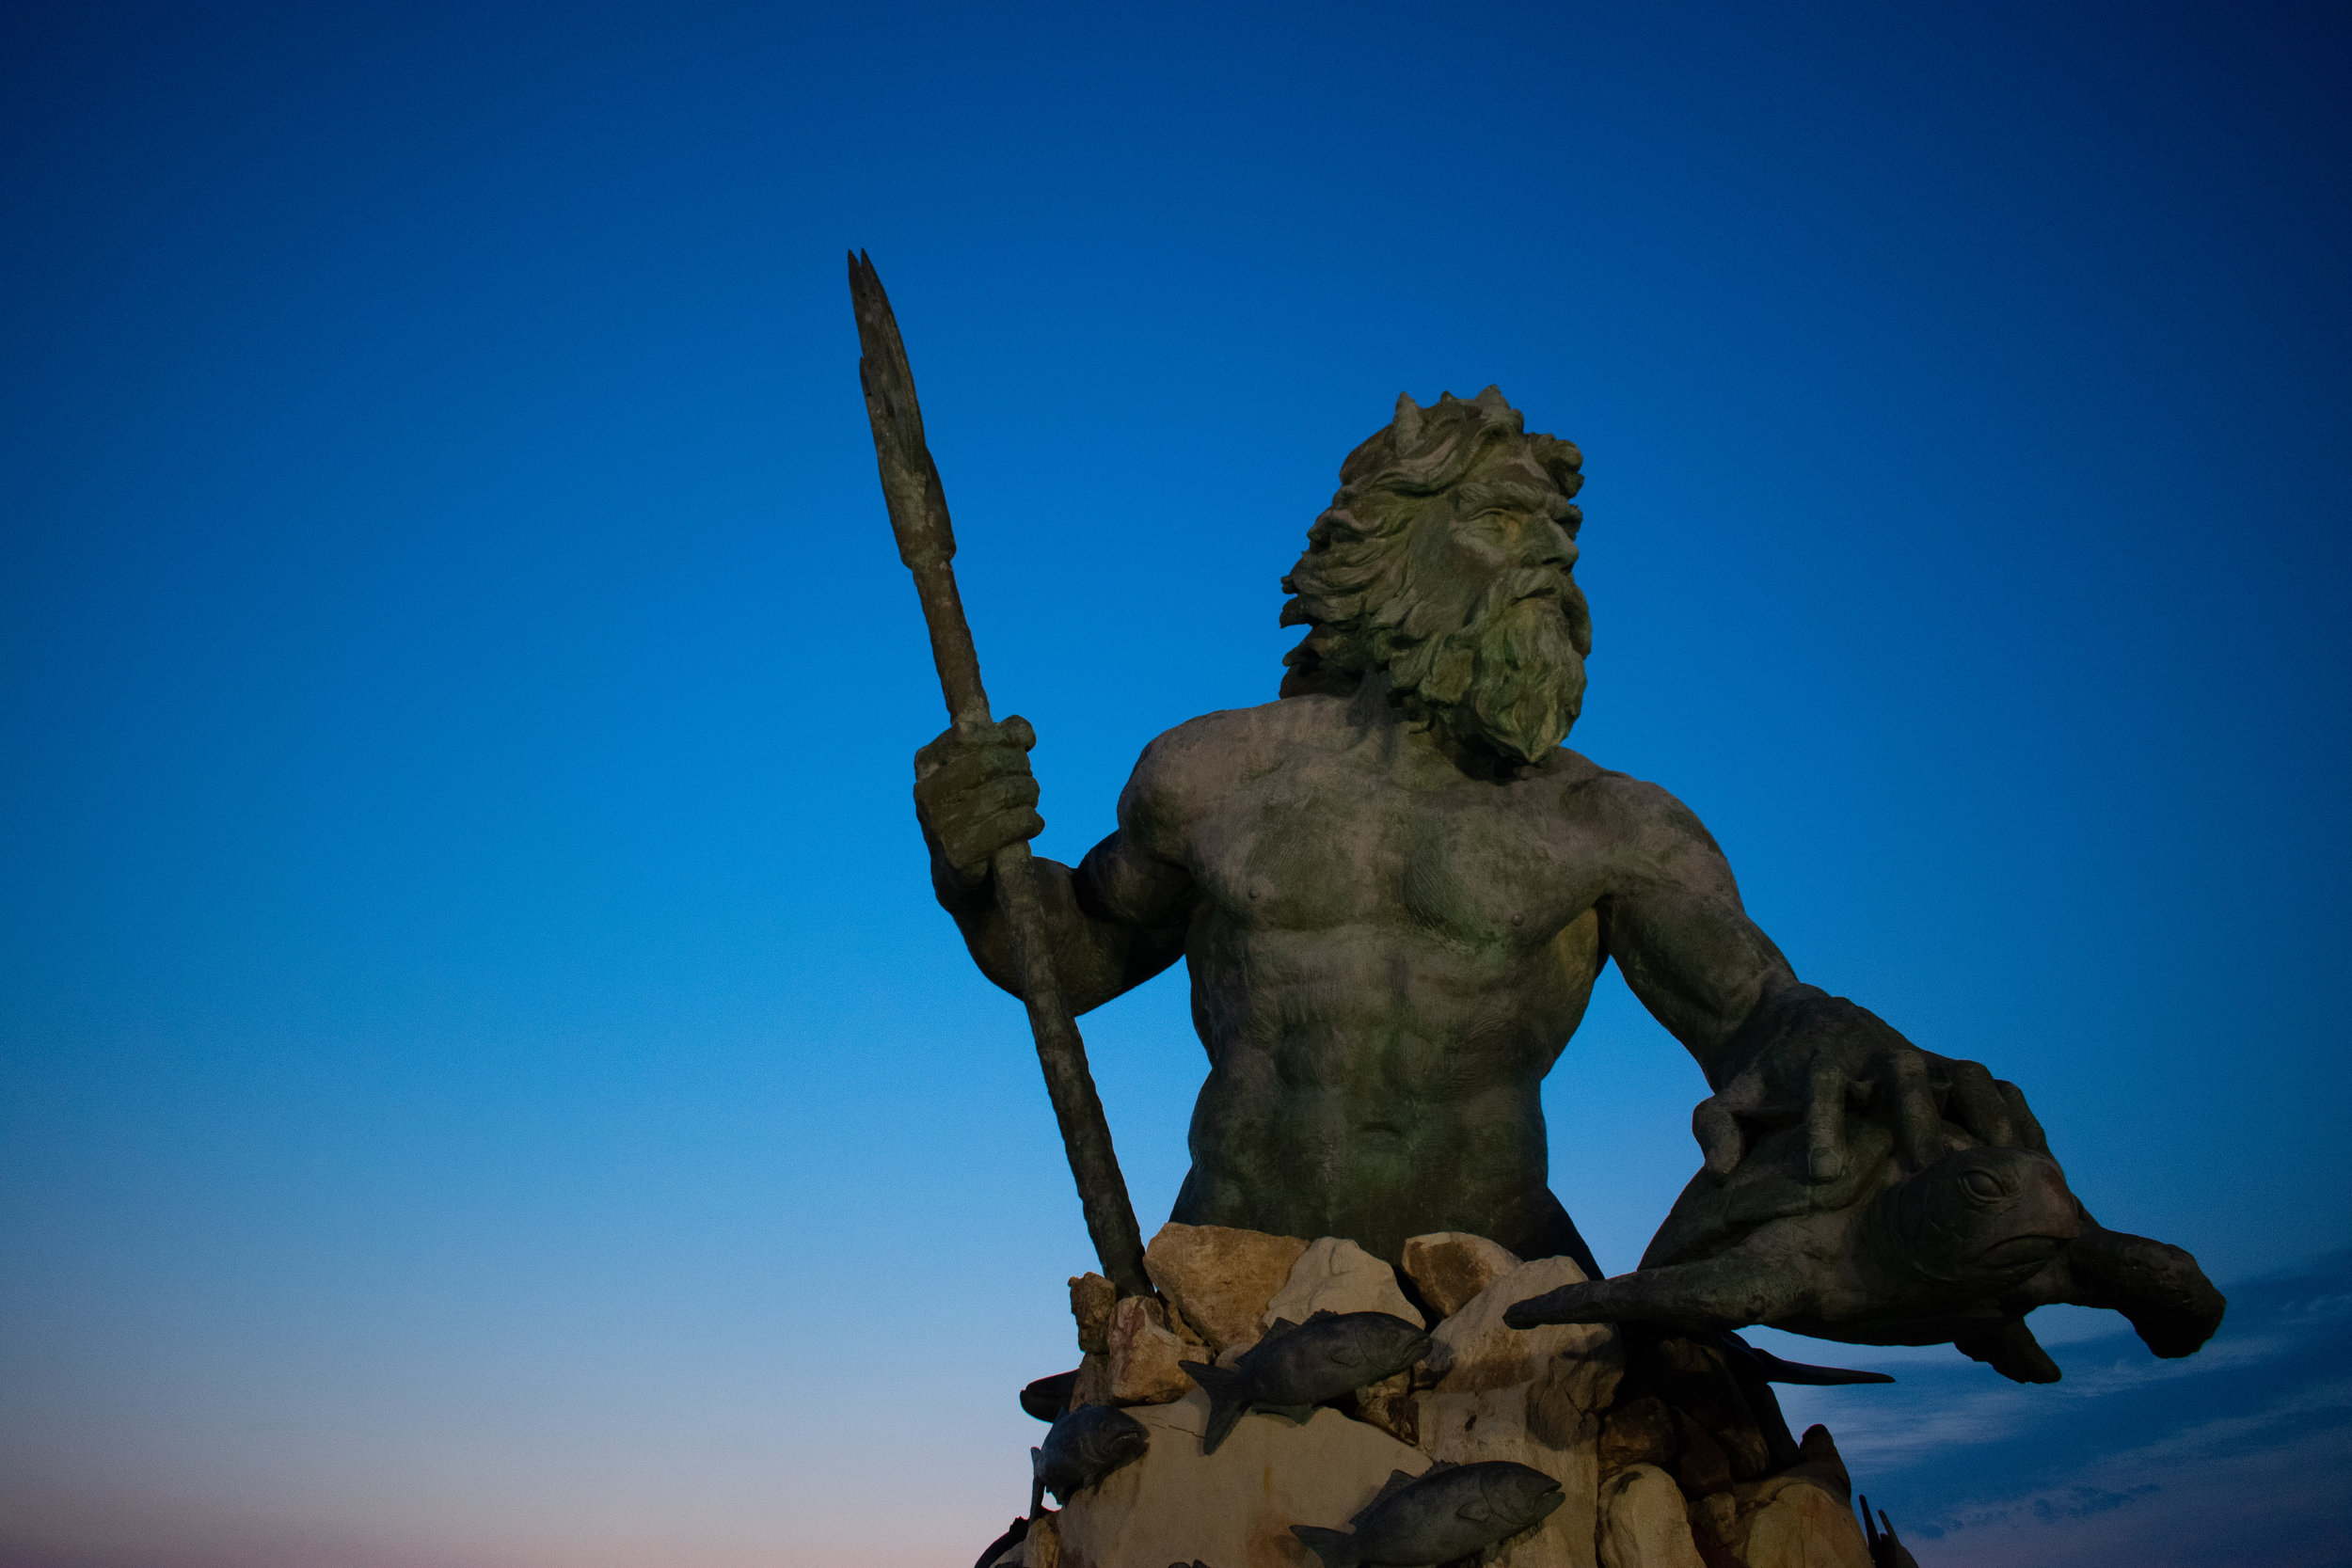 King Neptune Statue at 31st Street boardwalk Virginia Beach, VA